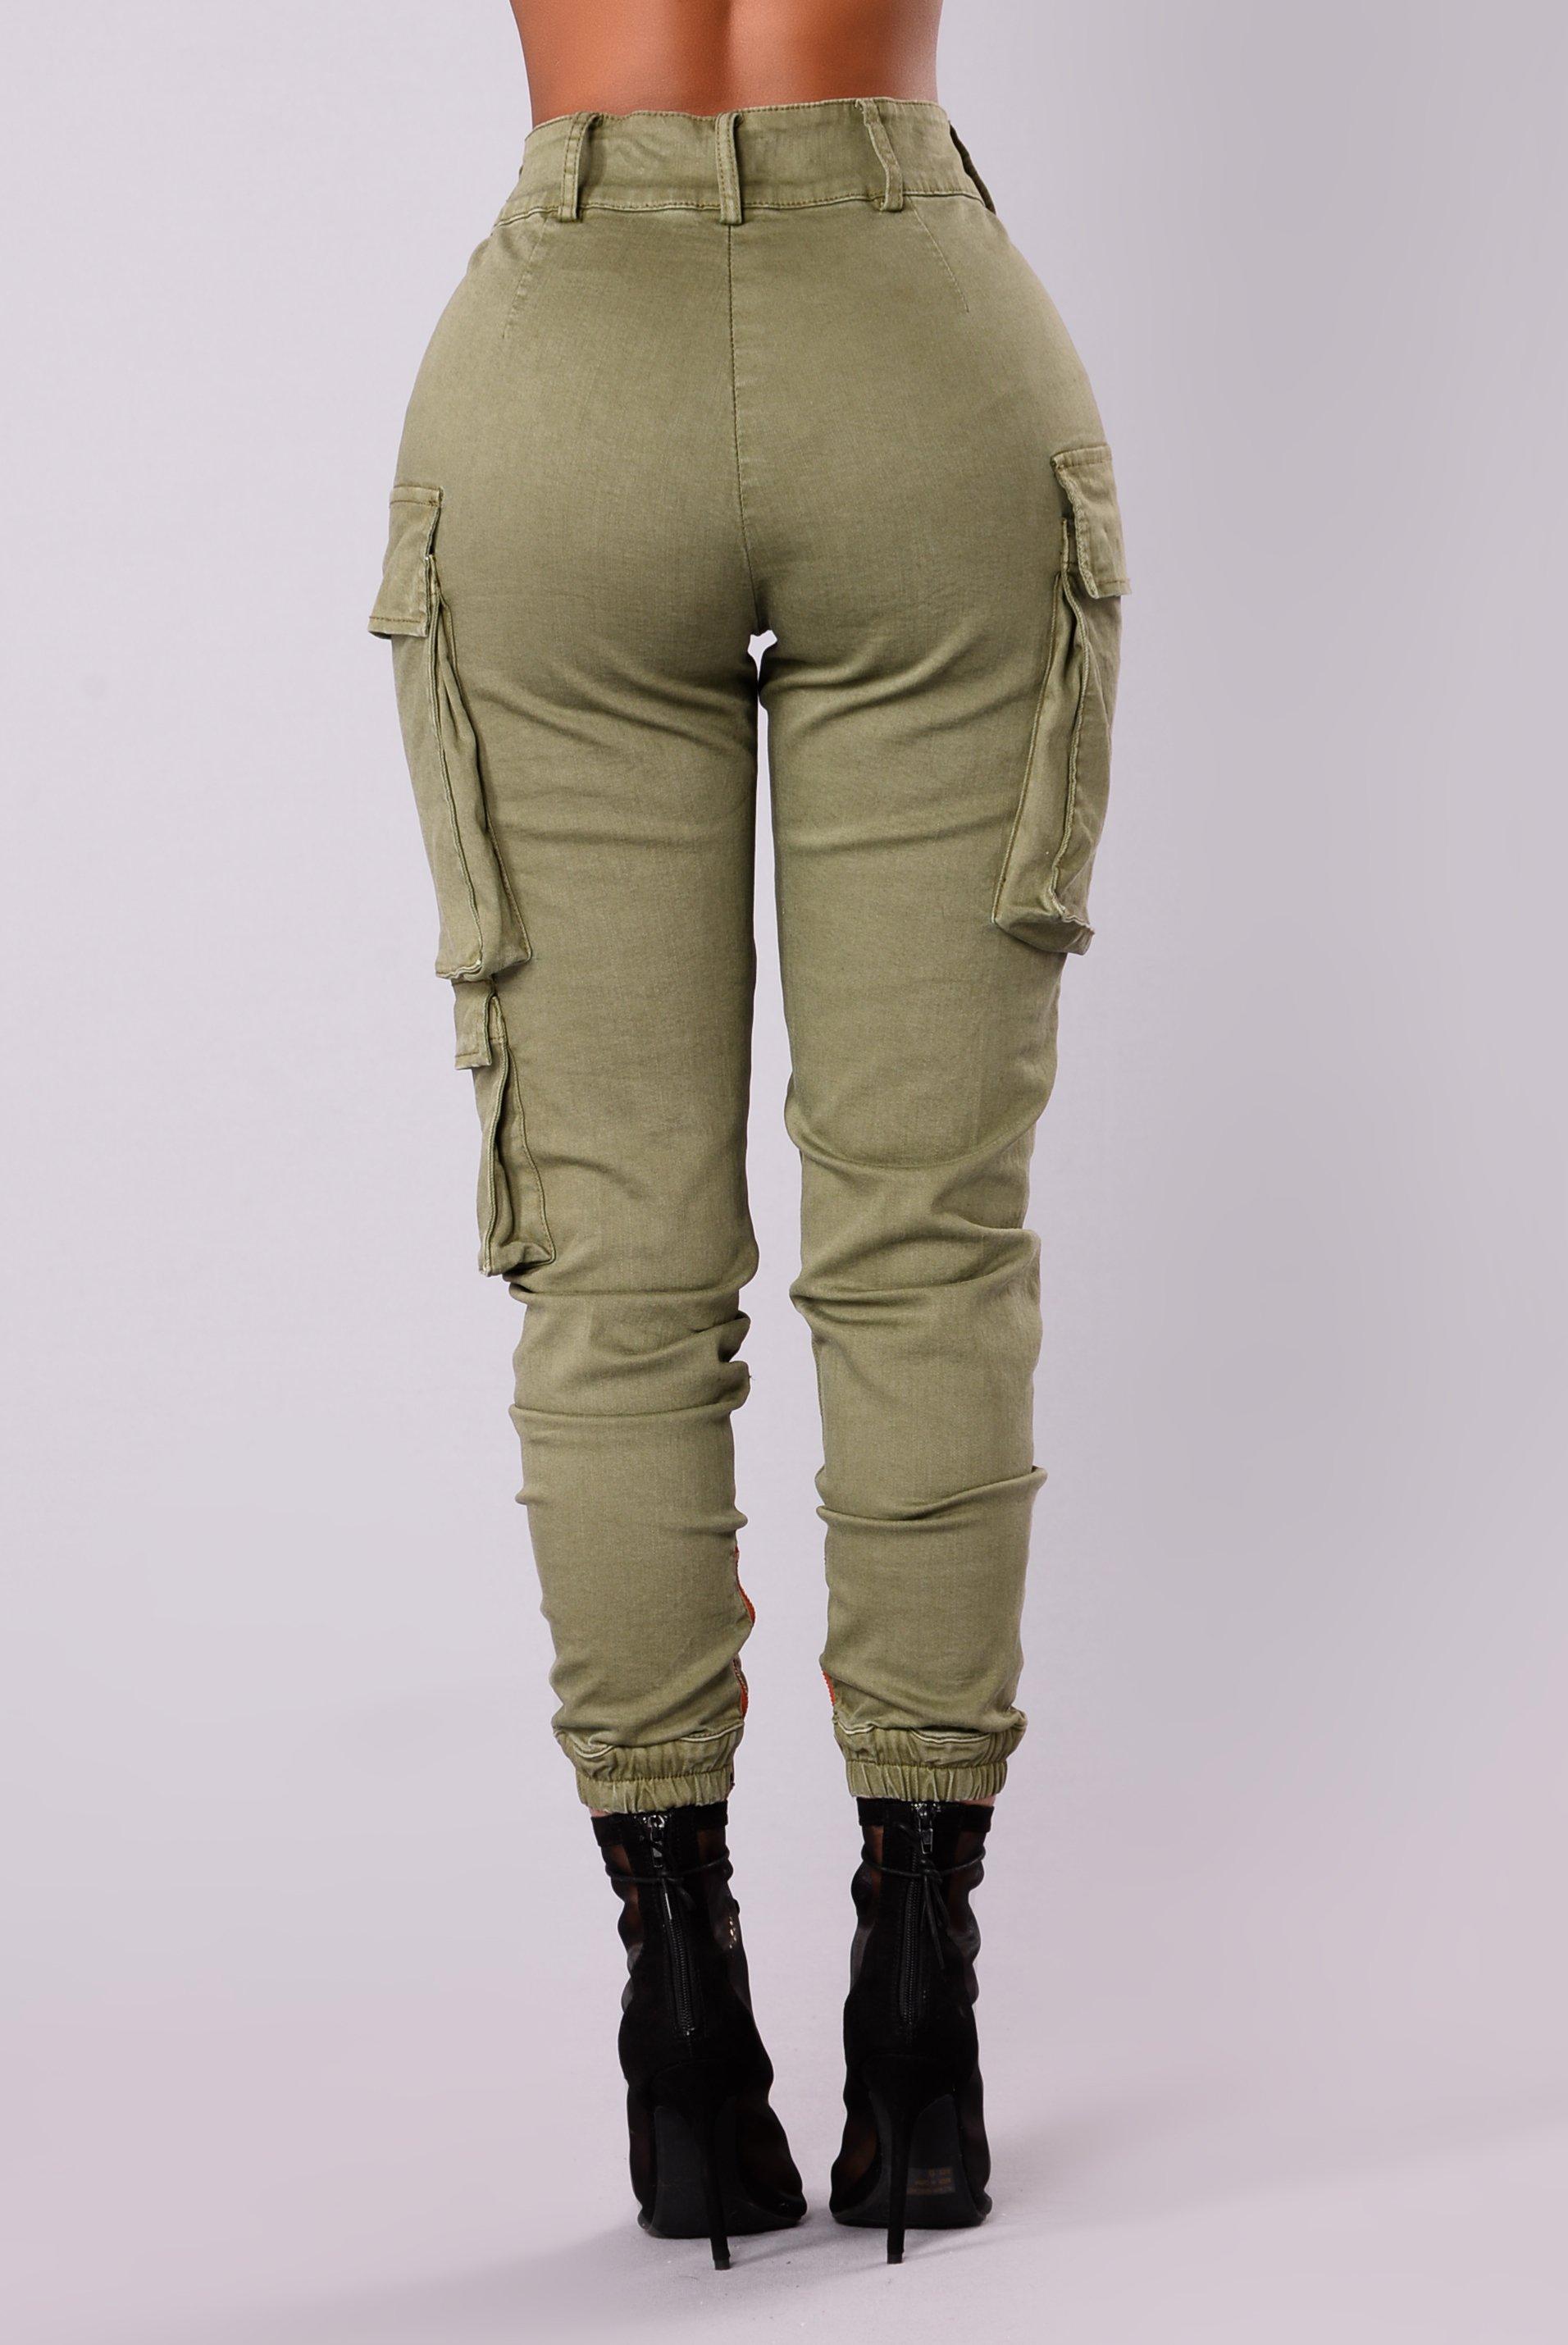 kalley cargo pants - olive ptnobsx